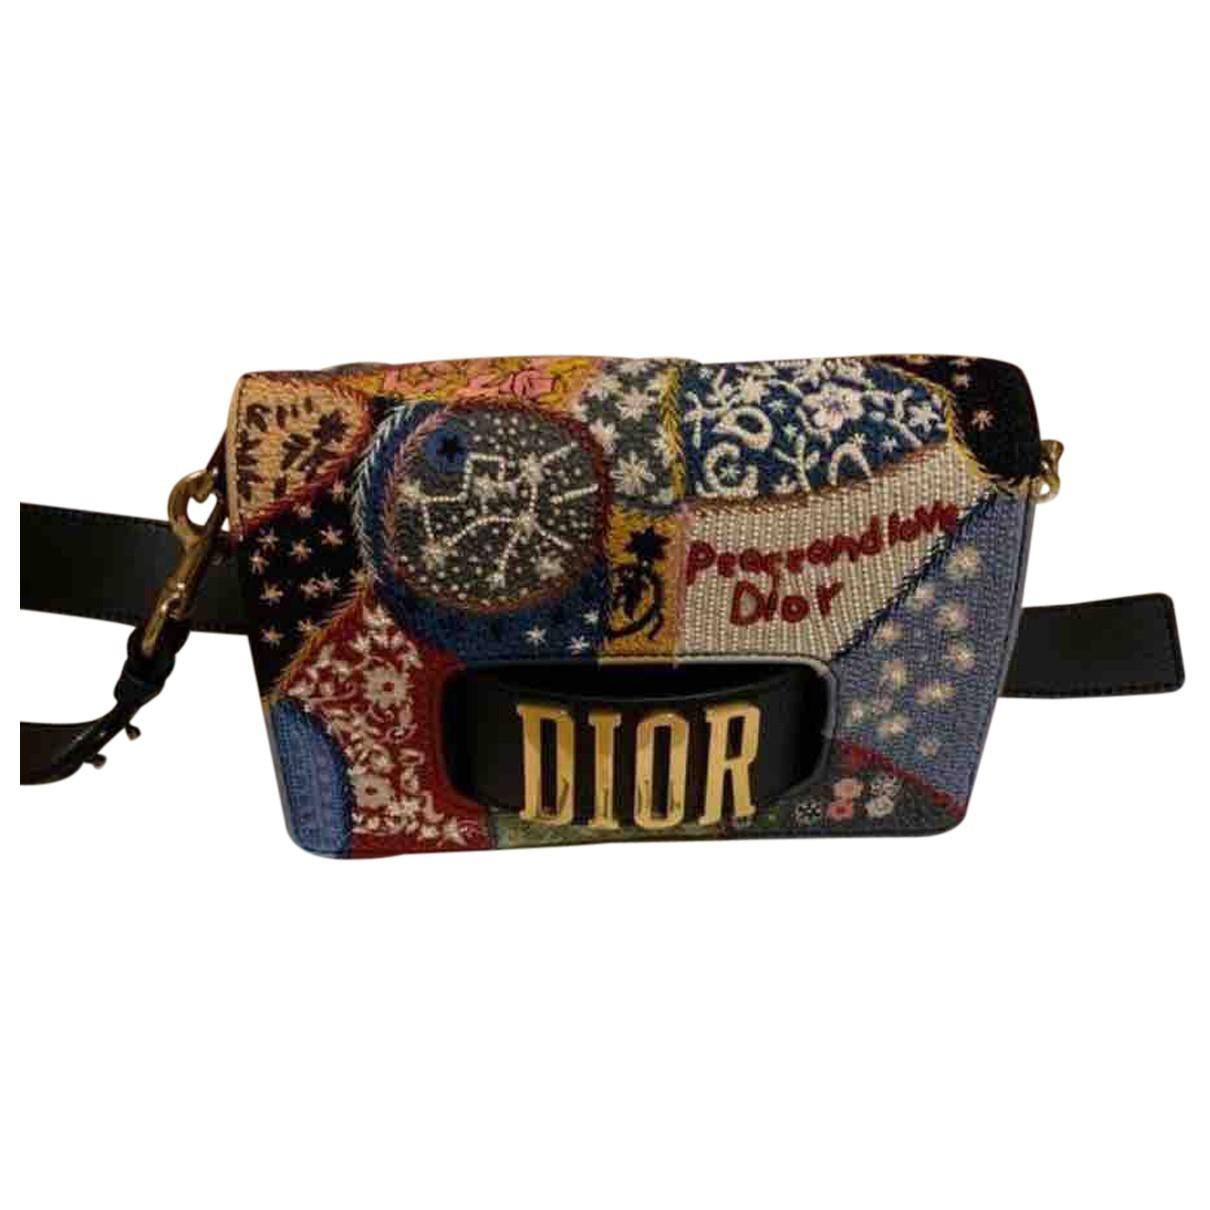 Dior - Sac a main Dio(r)evolution pour femme en cuir - multicolore